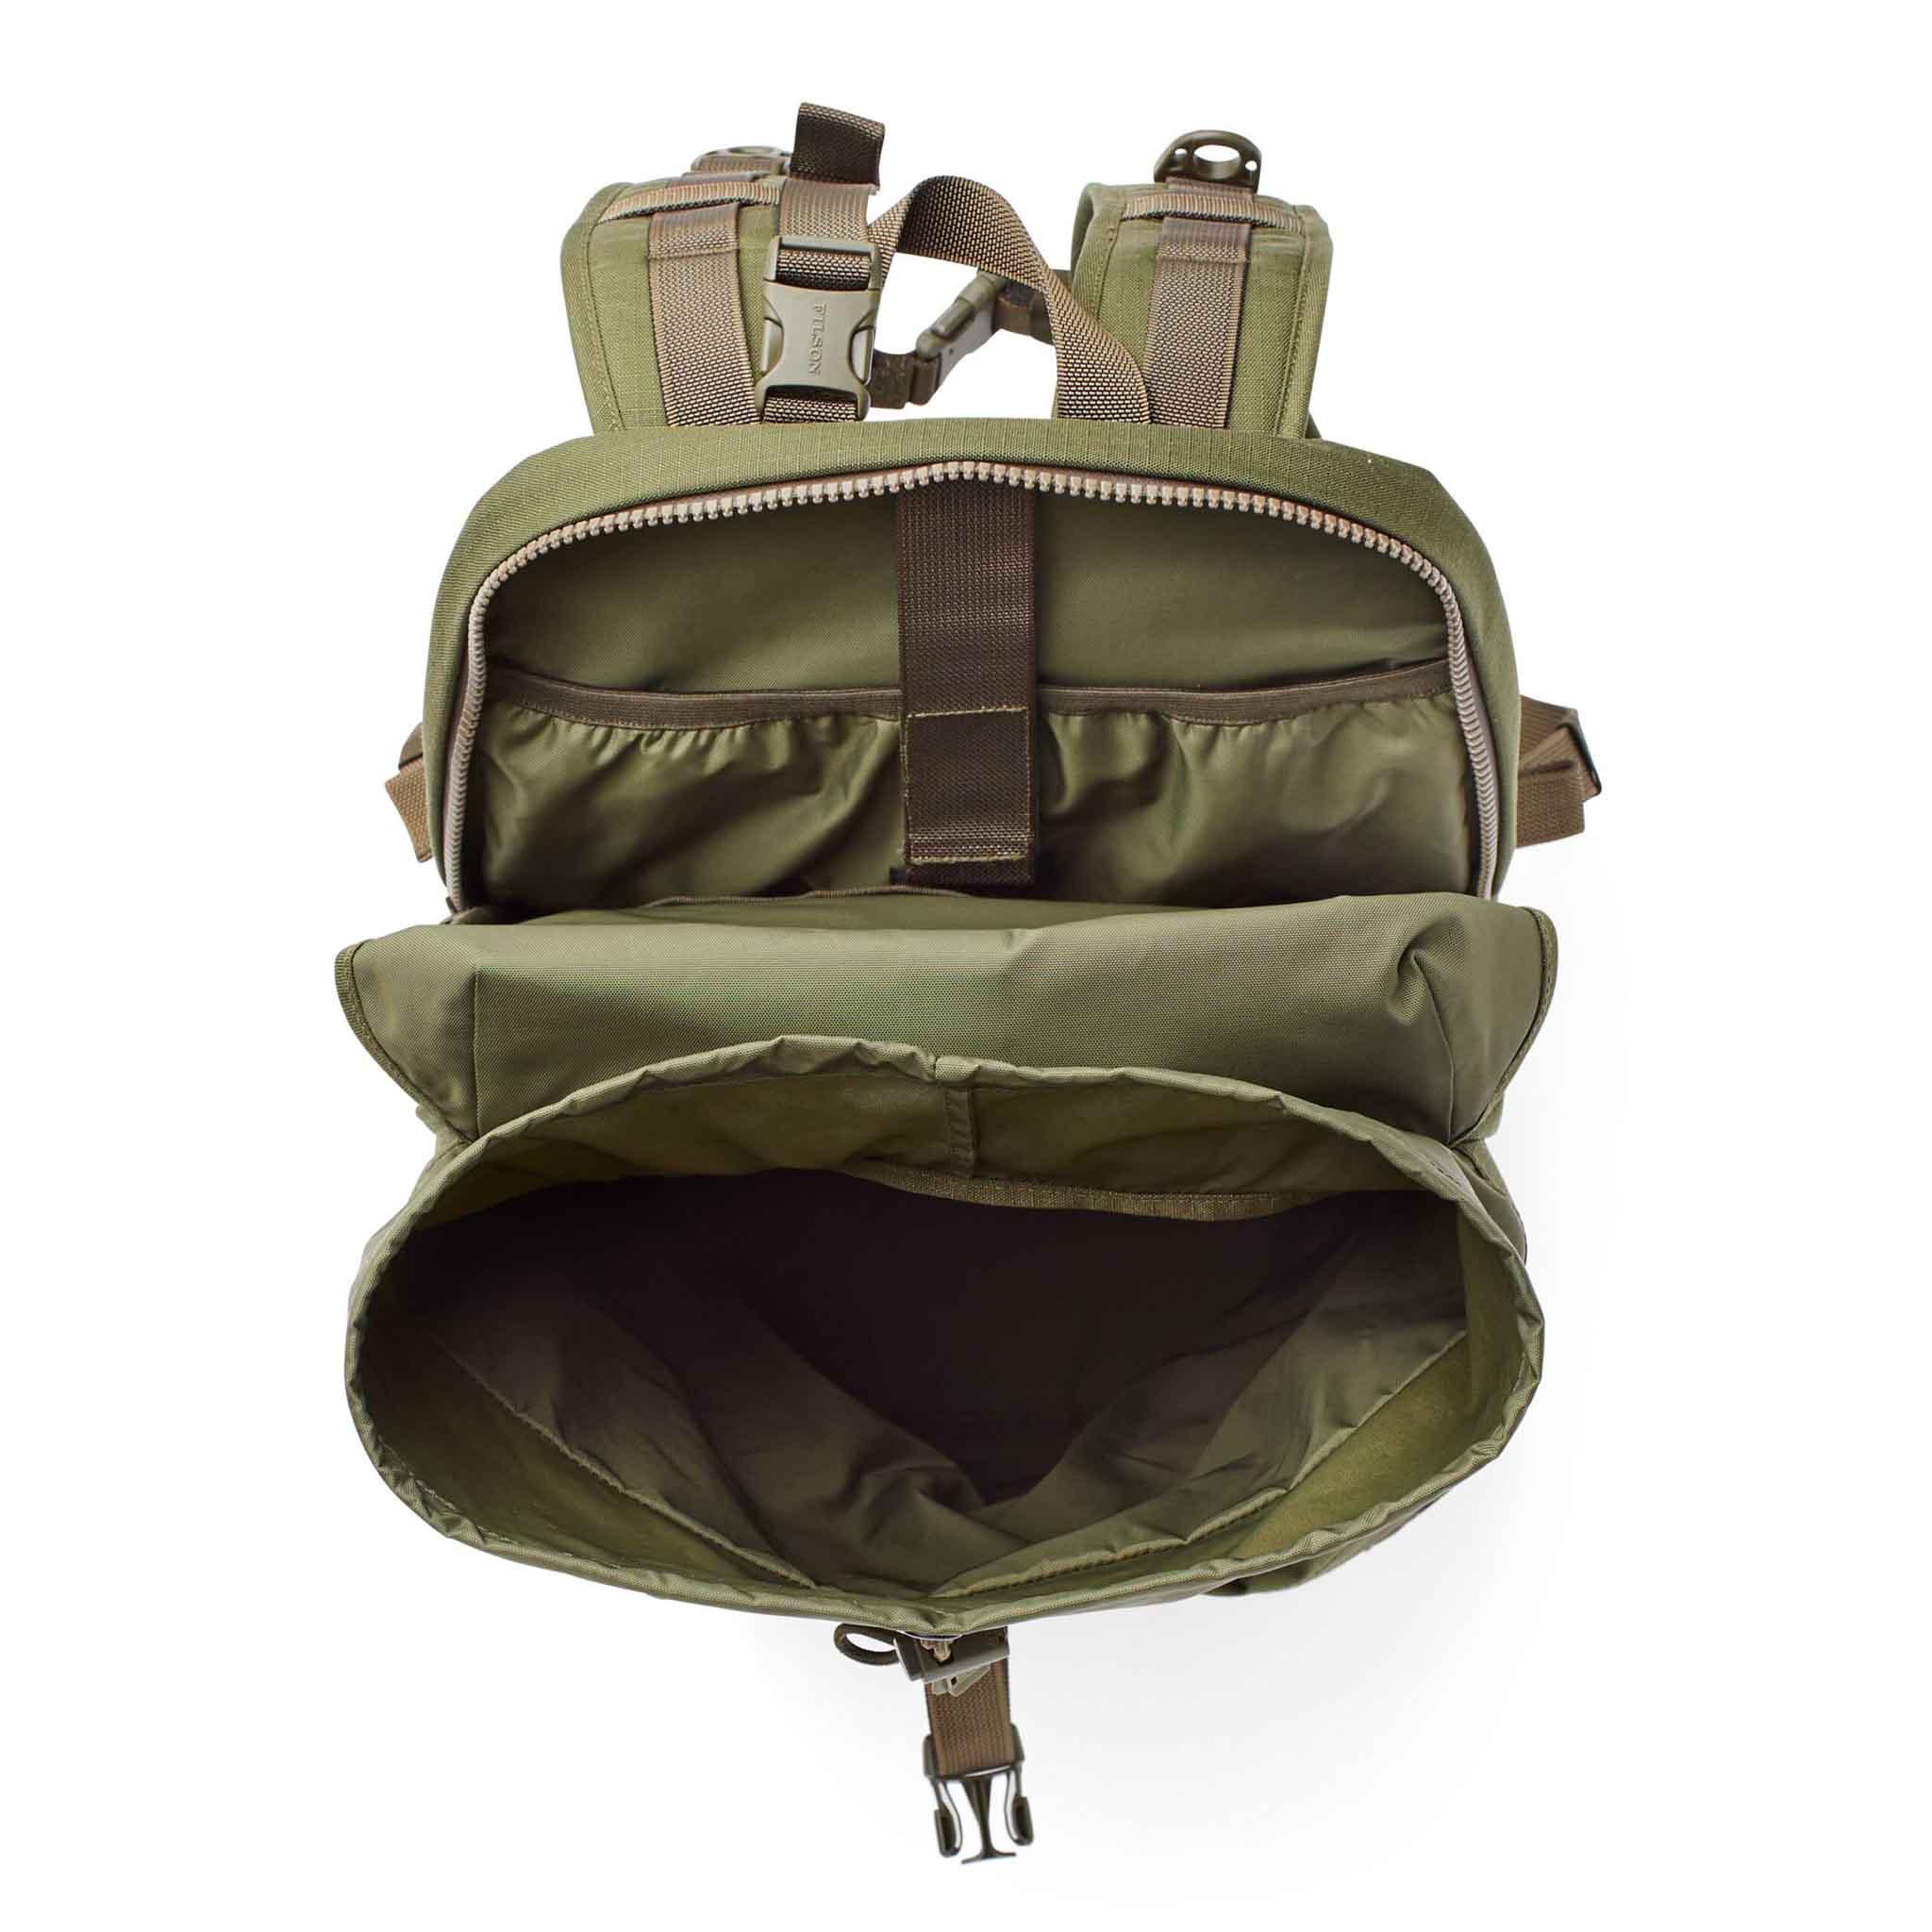 Filson Nylon Ripstop Backpack, Rucksack, Gross real wear München, Olive